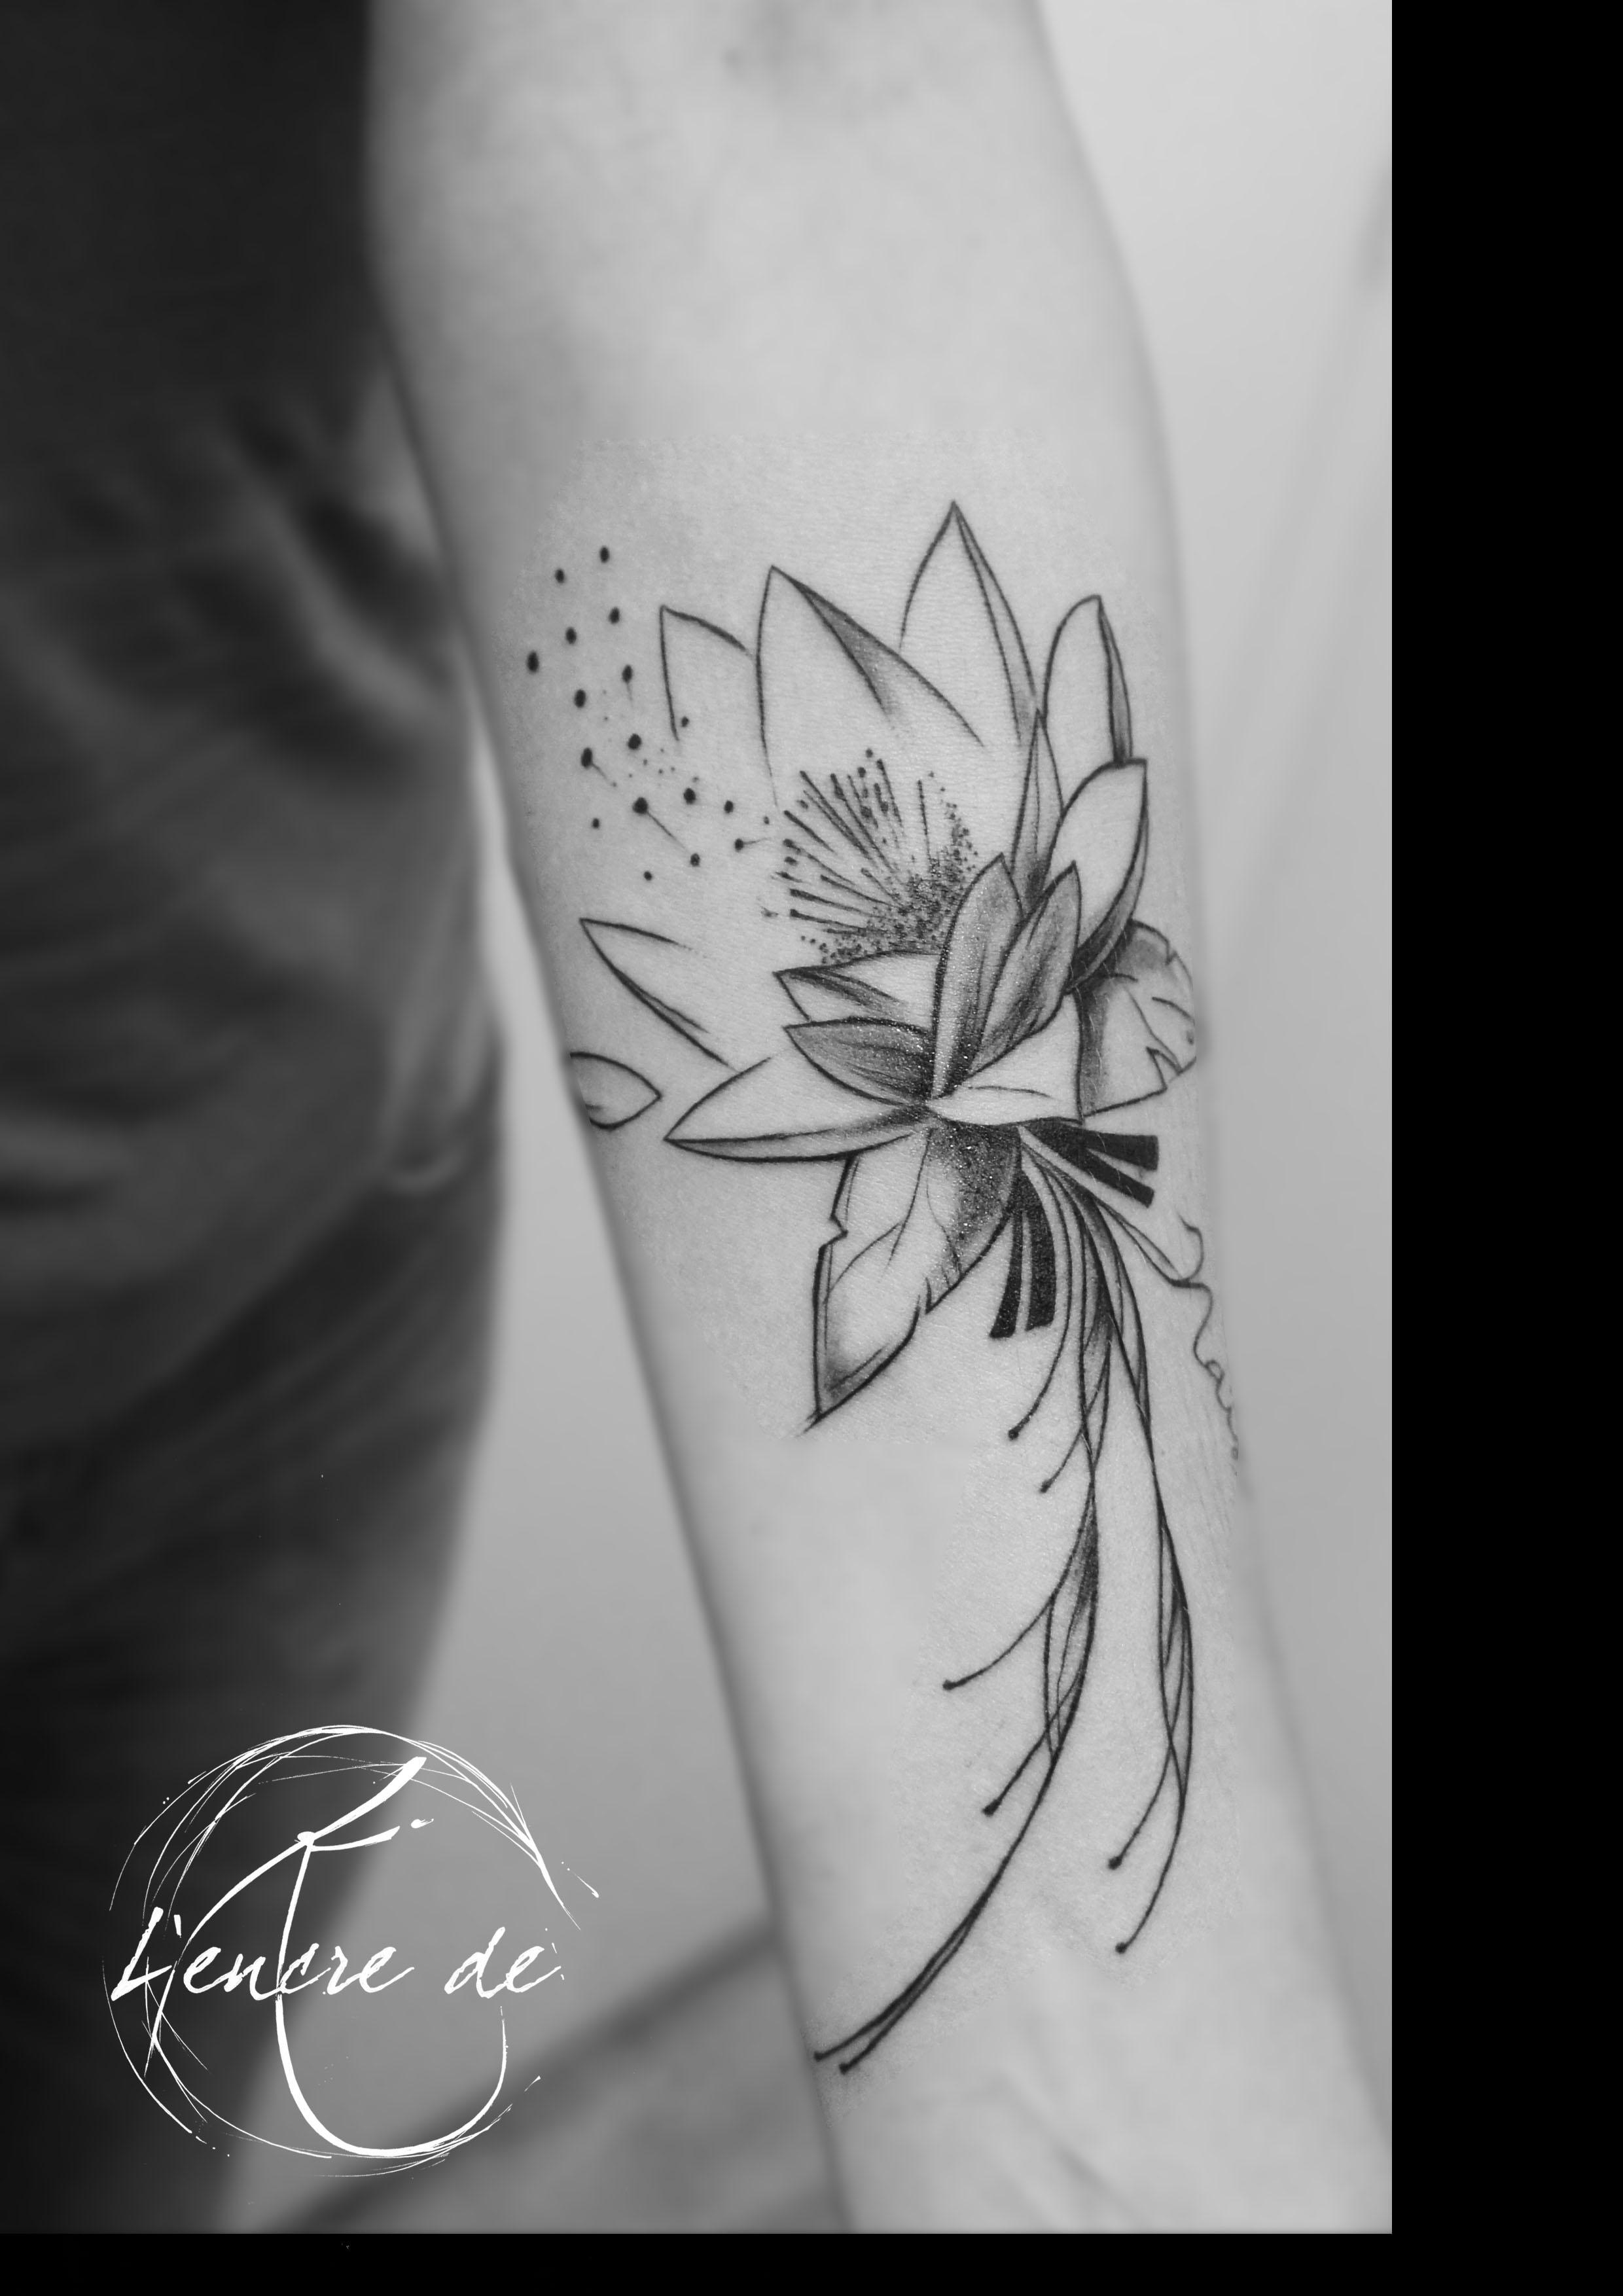 Tatouage Fleur De Lotus Nuque Tattoo De Flor Na Costela Pesquisa